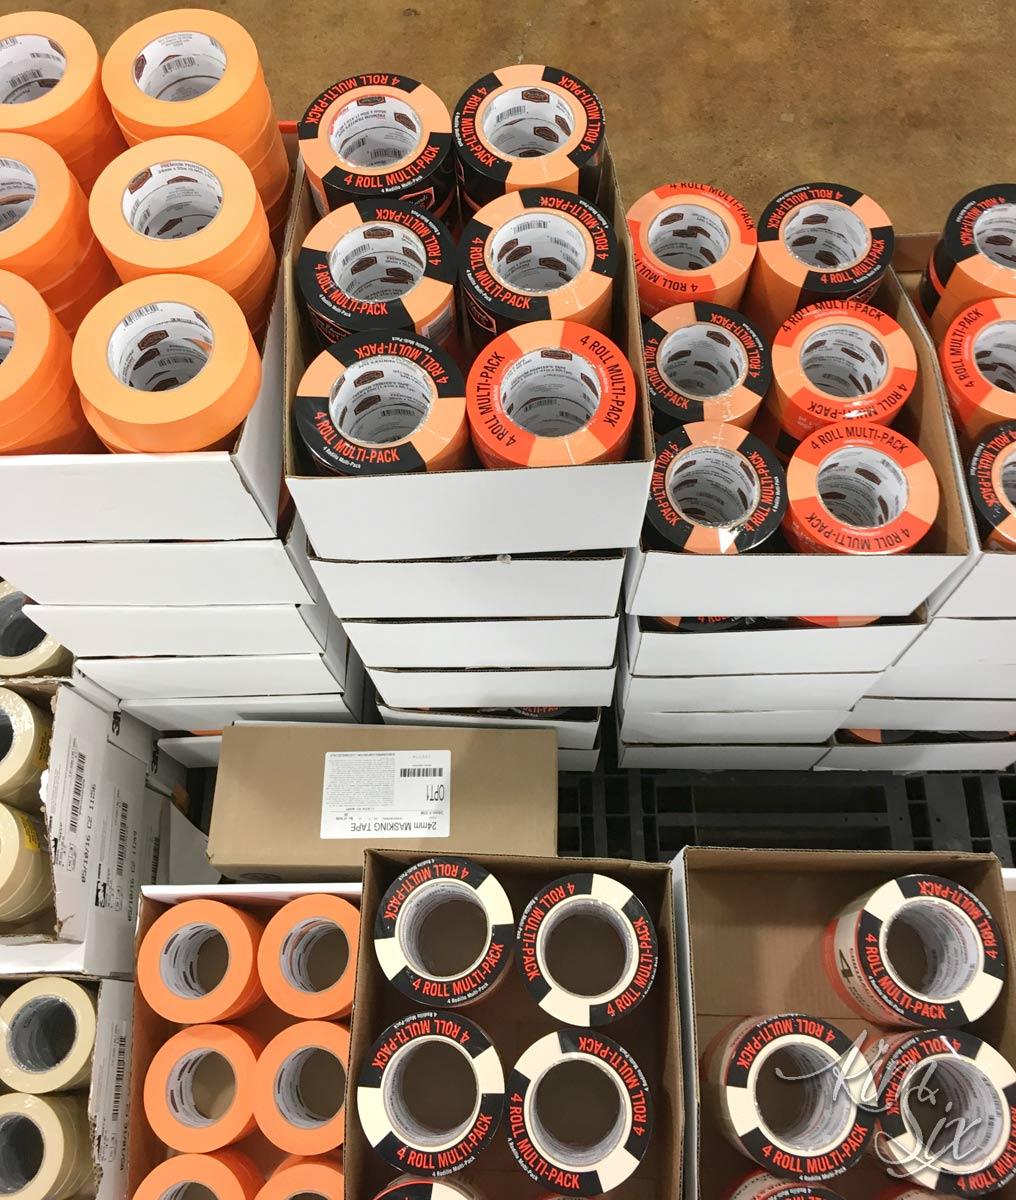 Dunn Edwards Painters Tape Orange